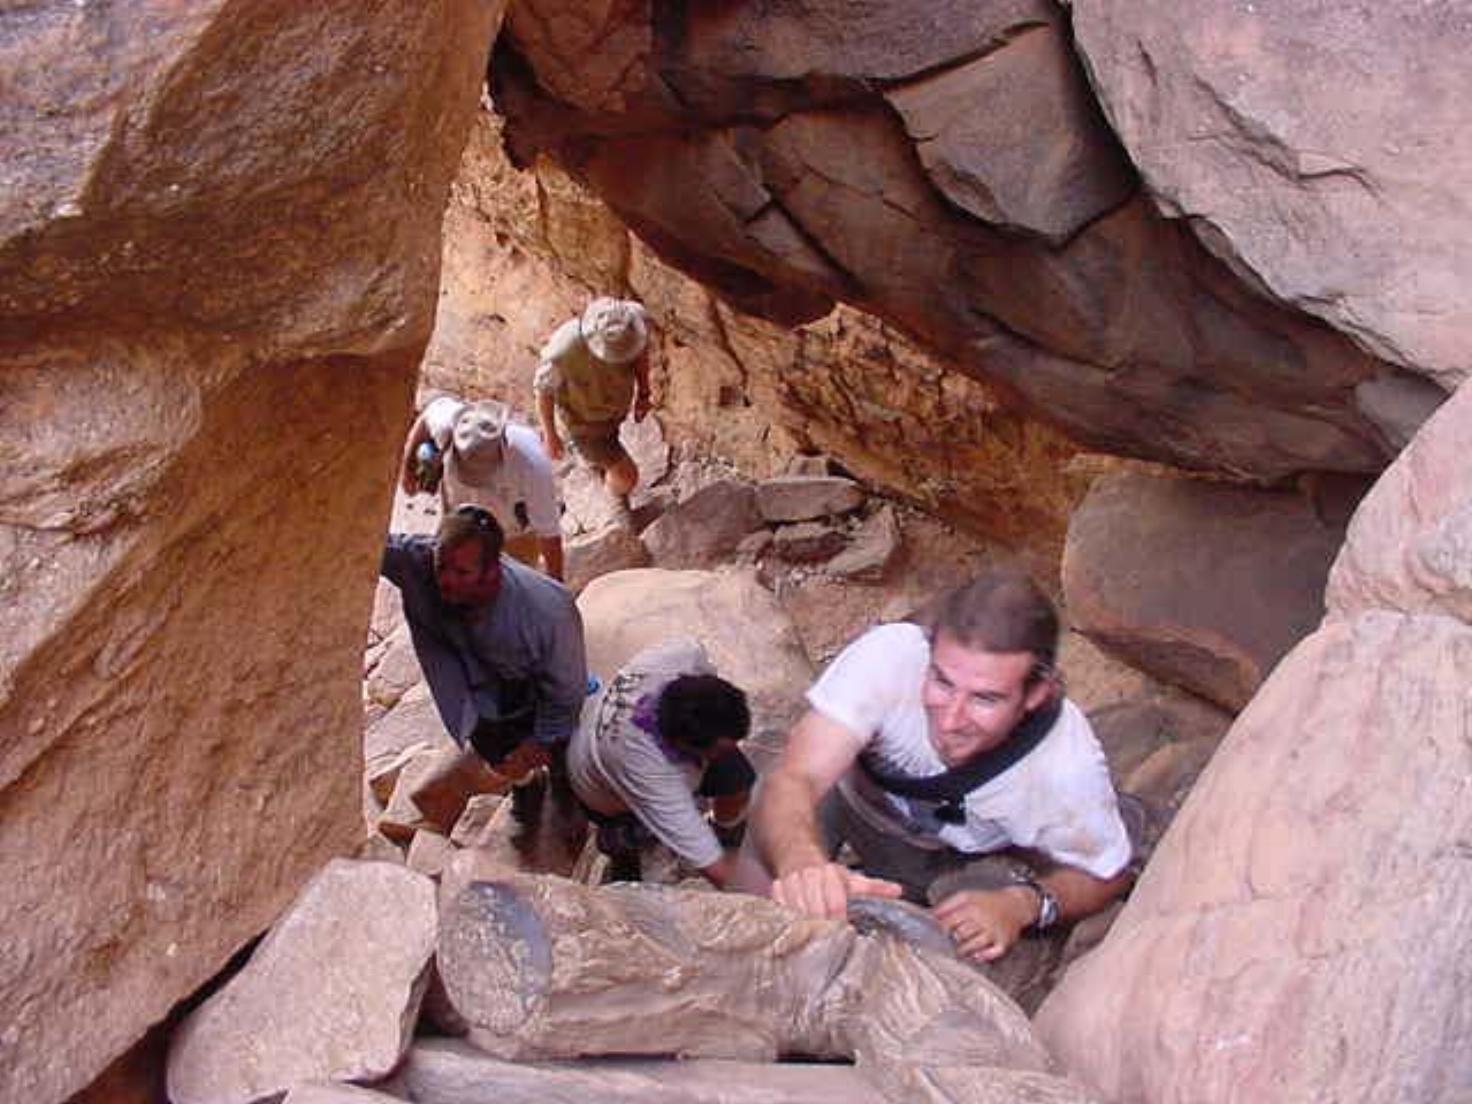 Jim Leach leads the group up the climb